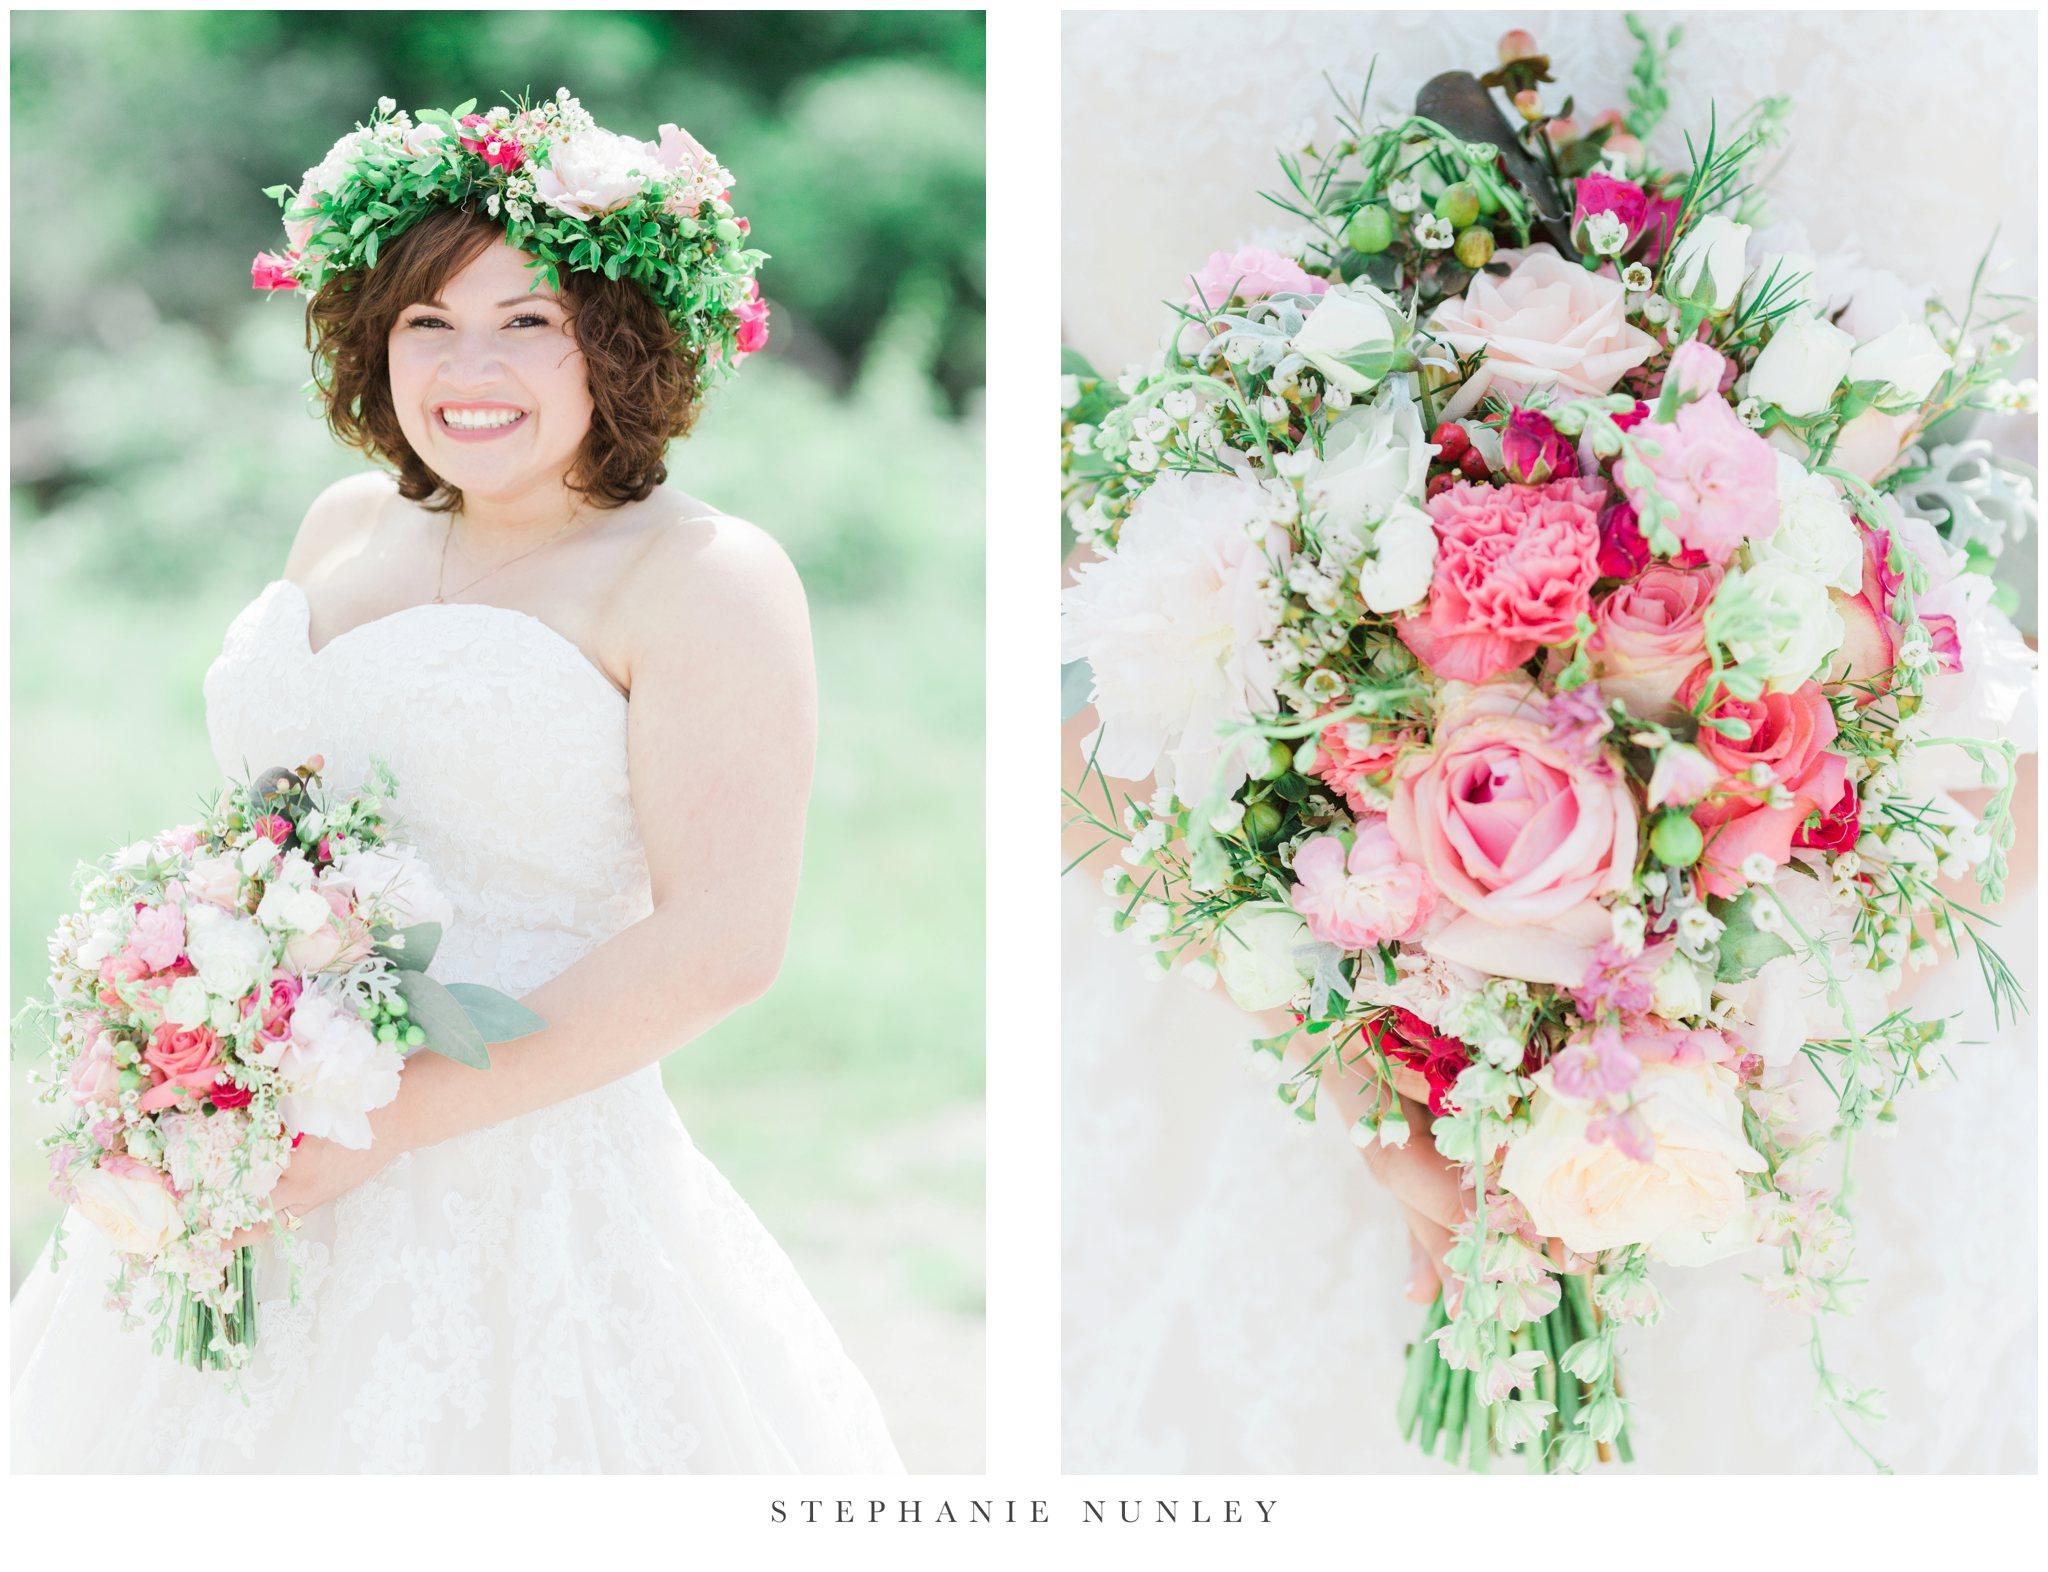 romantic-outdoor-wedding-with-flower-crown-0045.jpg